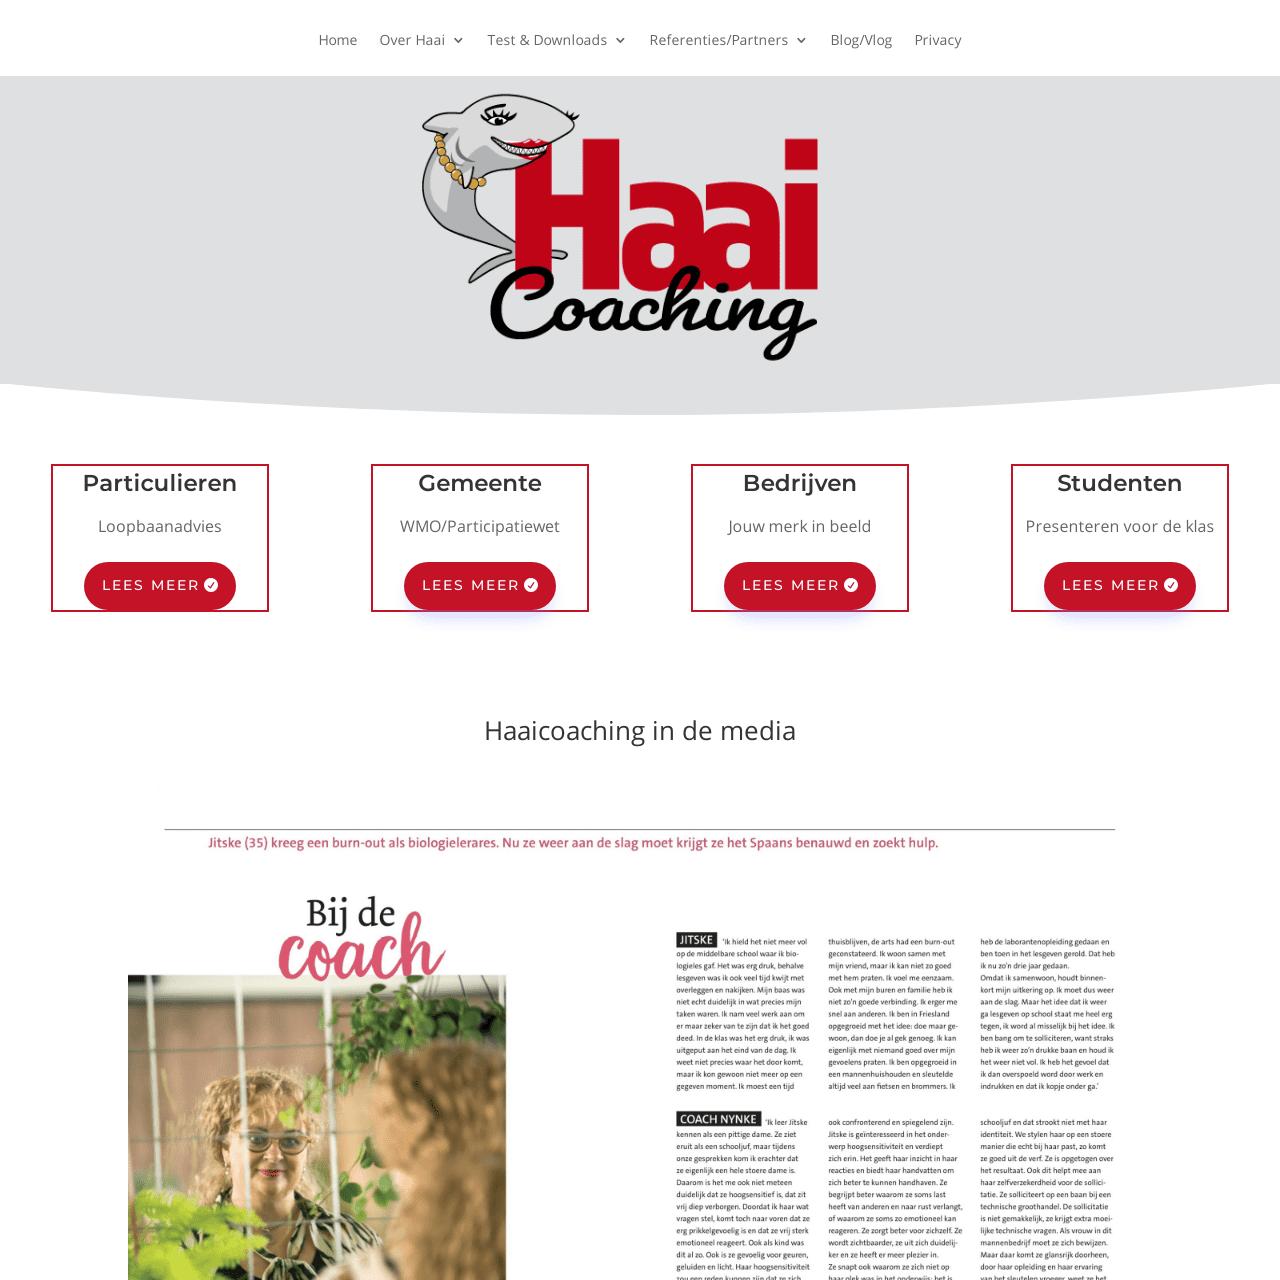 Haaicoaching site